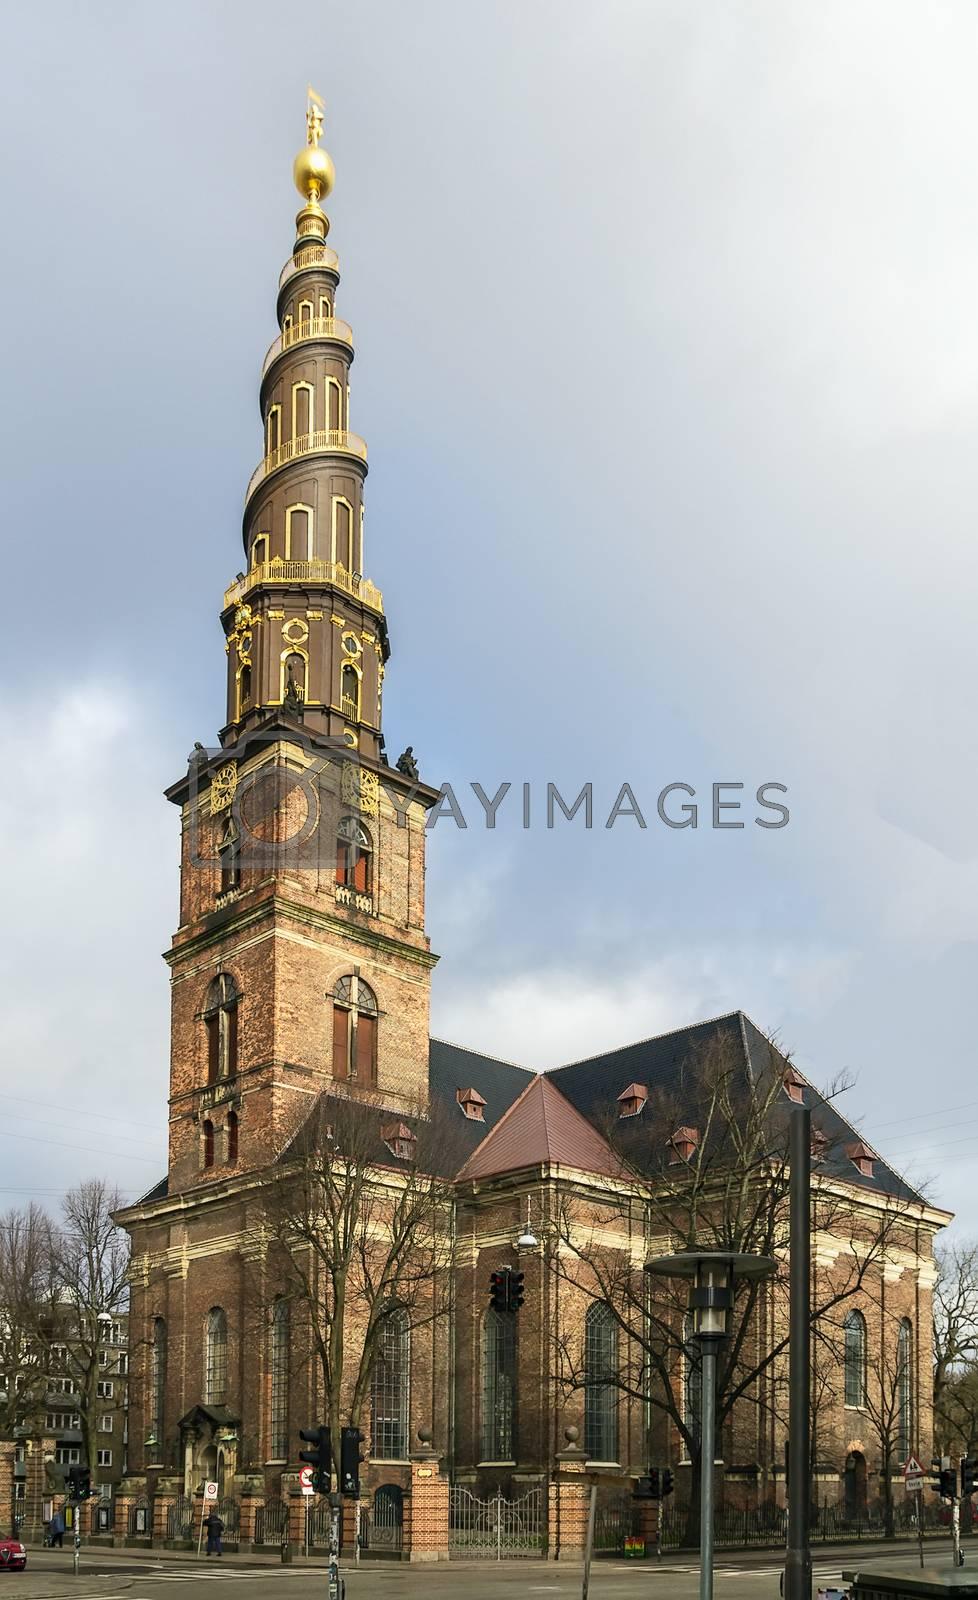 Church of Our Saviour, Copenhagen by borisb17